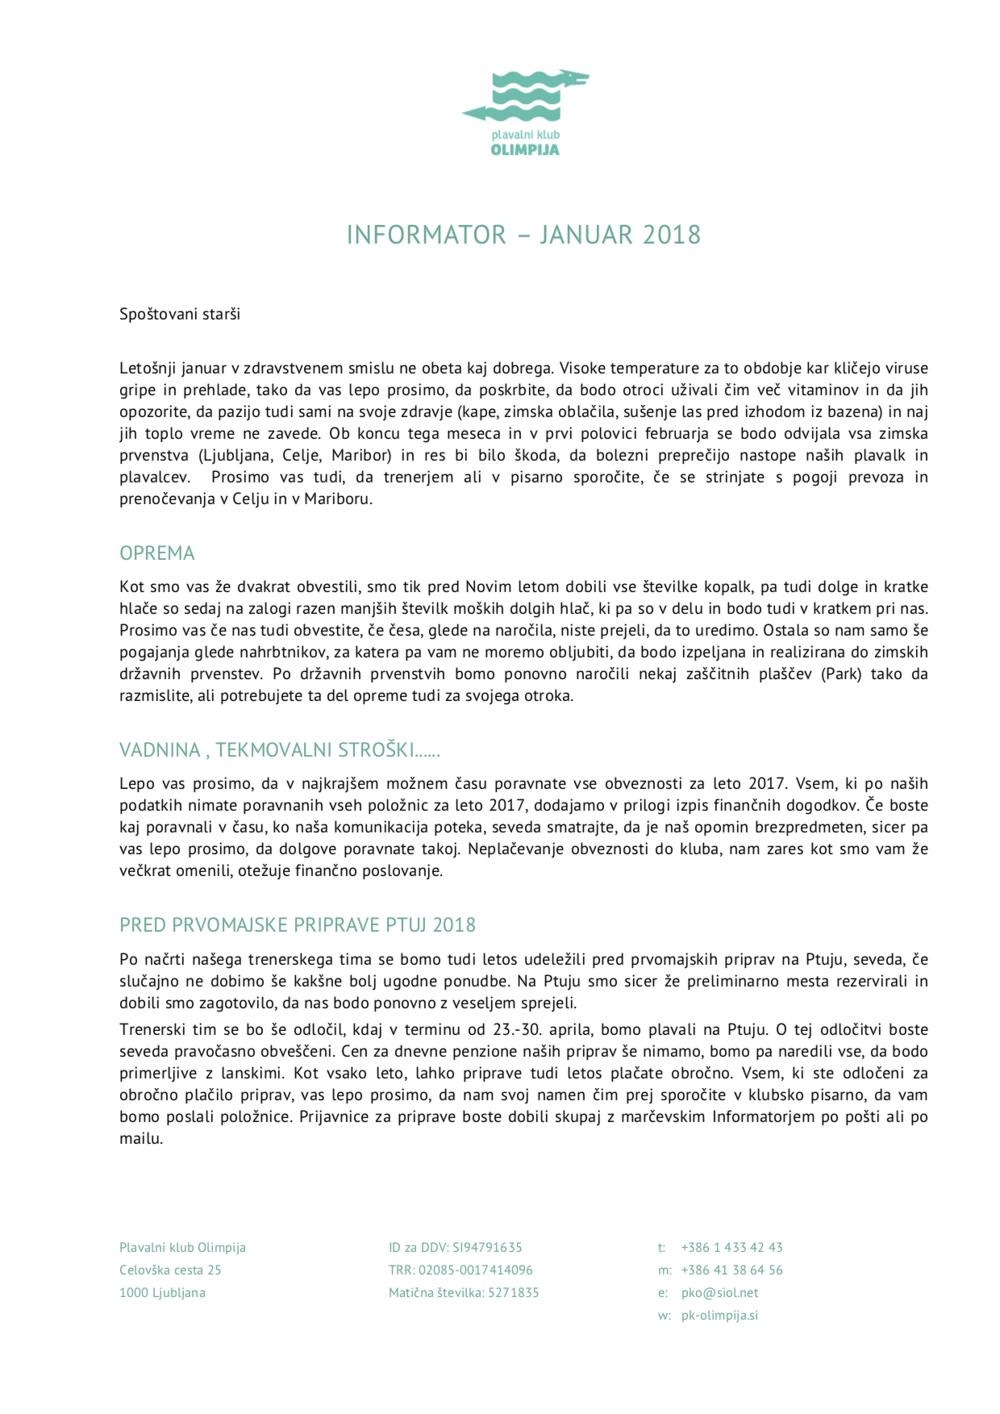 pko-informator-201801.png